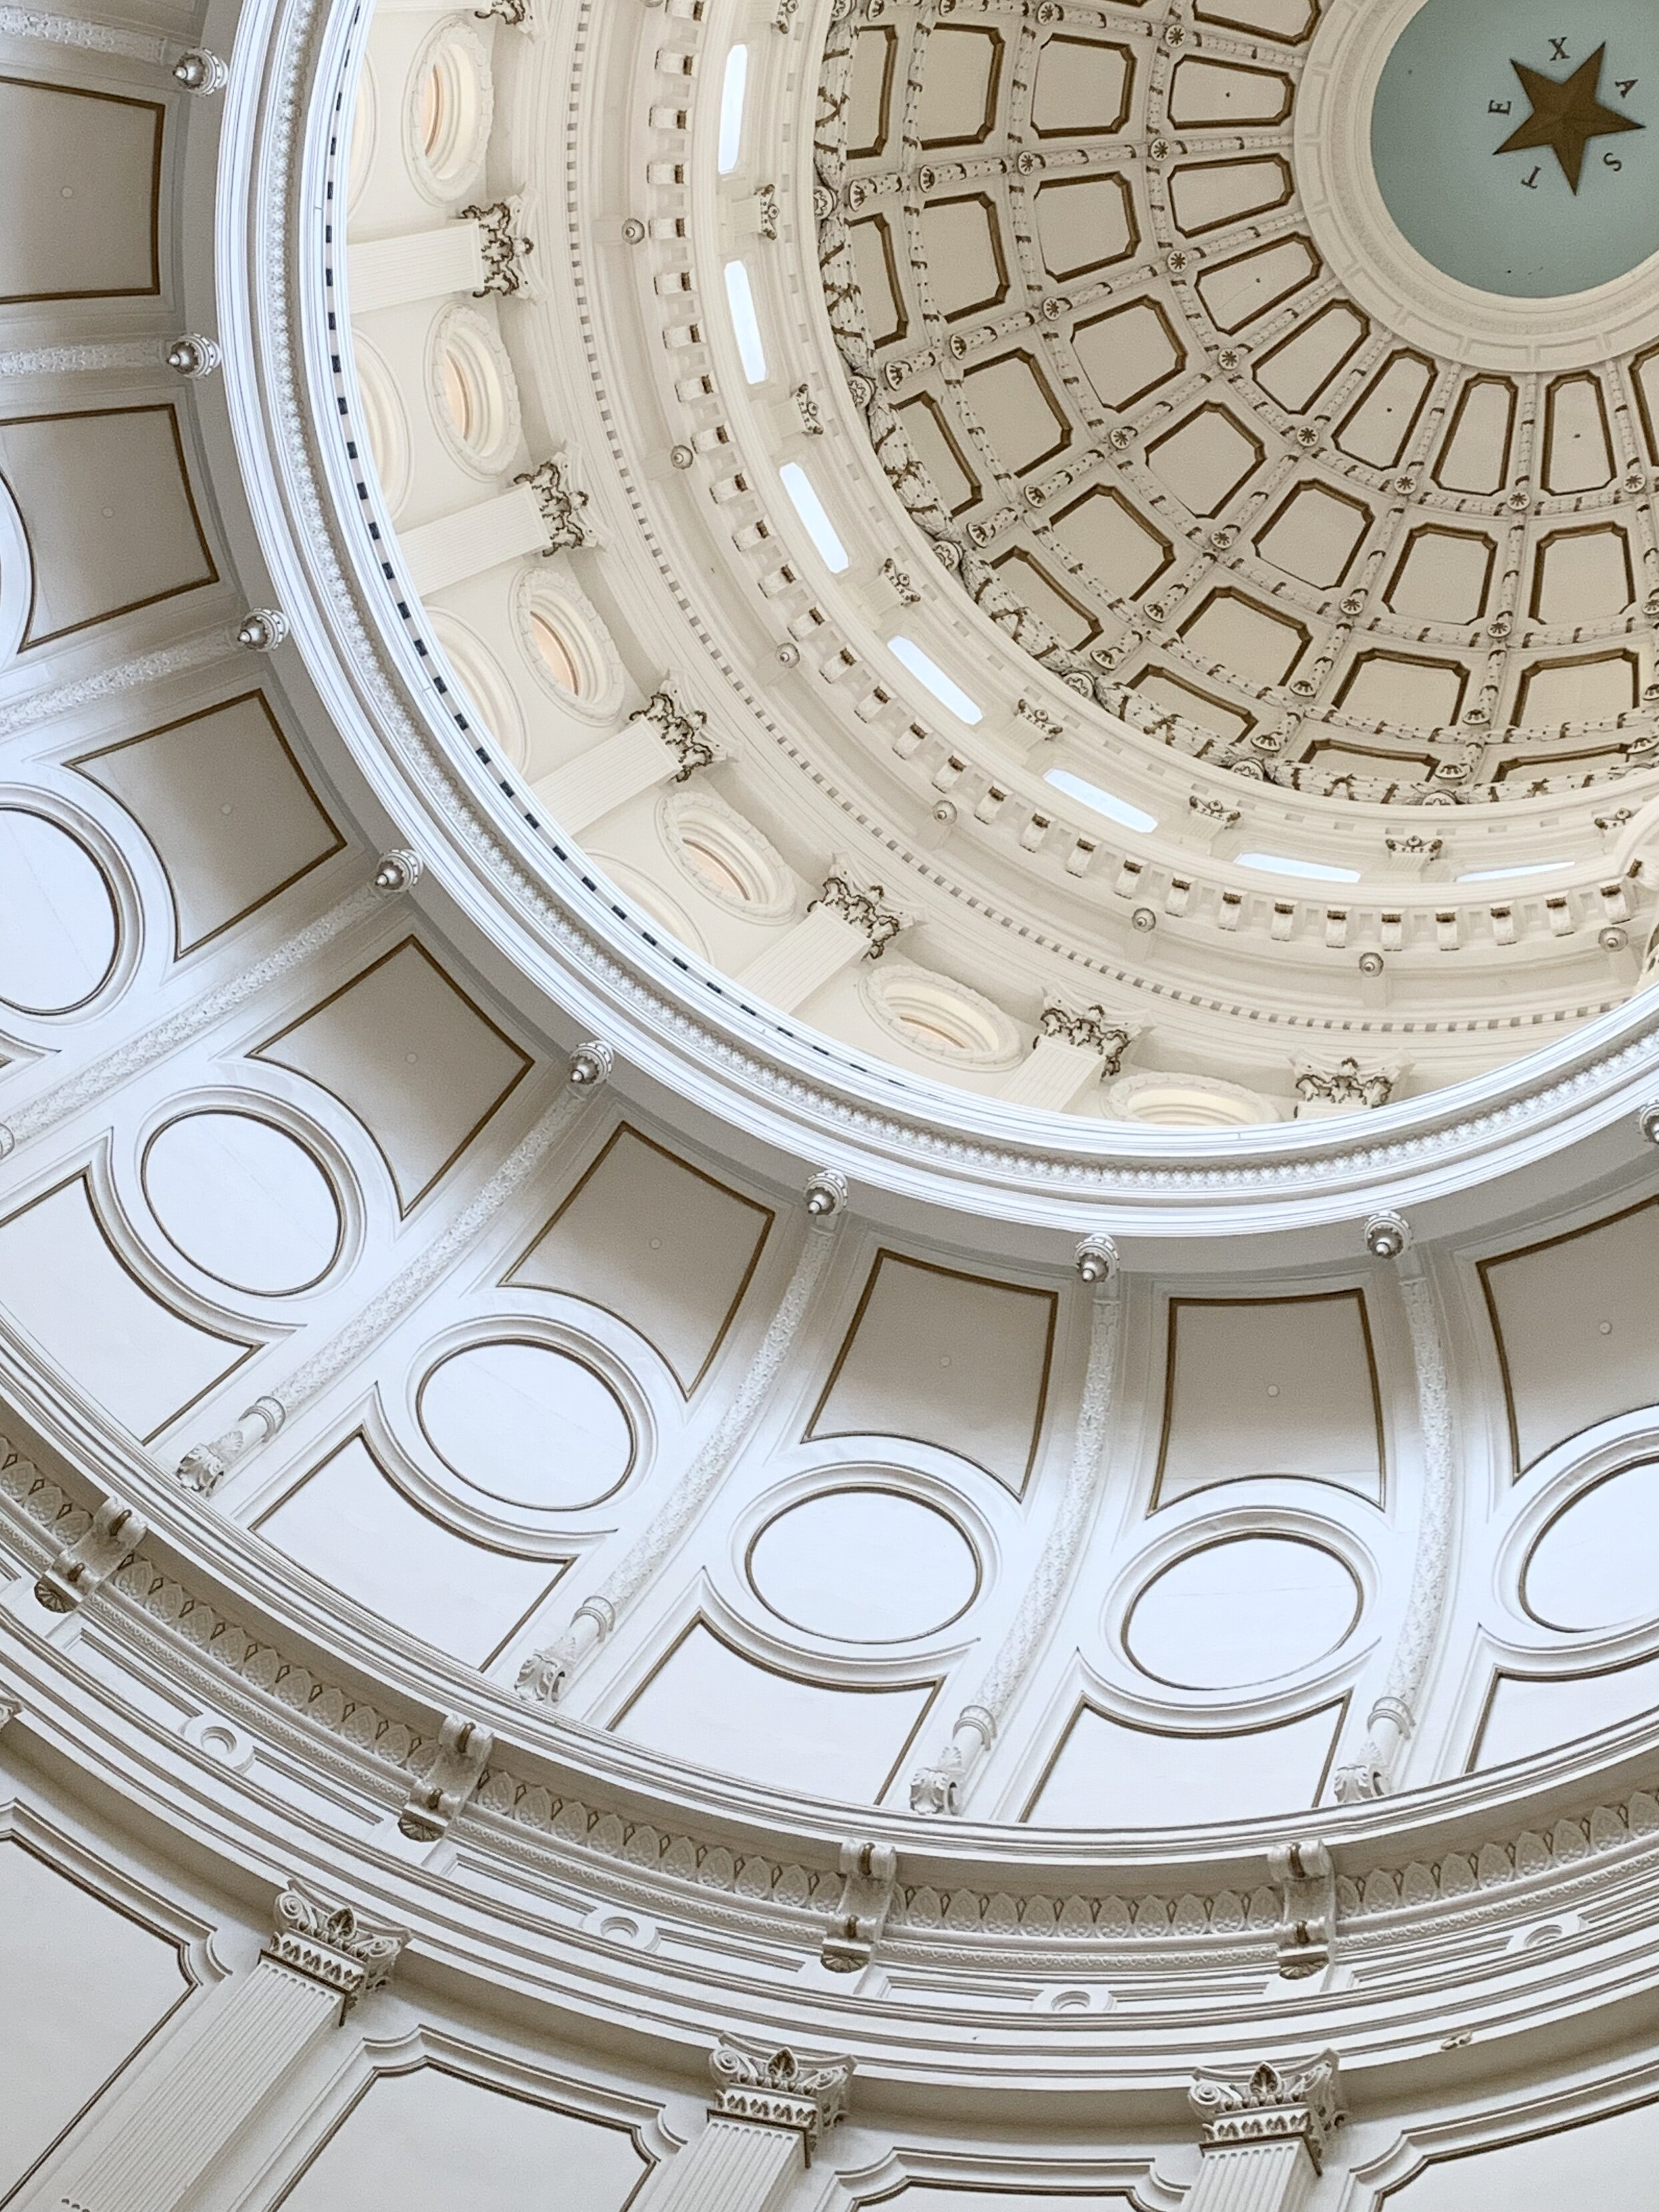 Wensdays-Travel-Guide-Austin